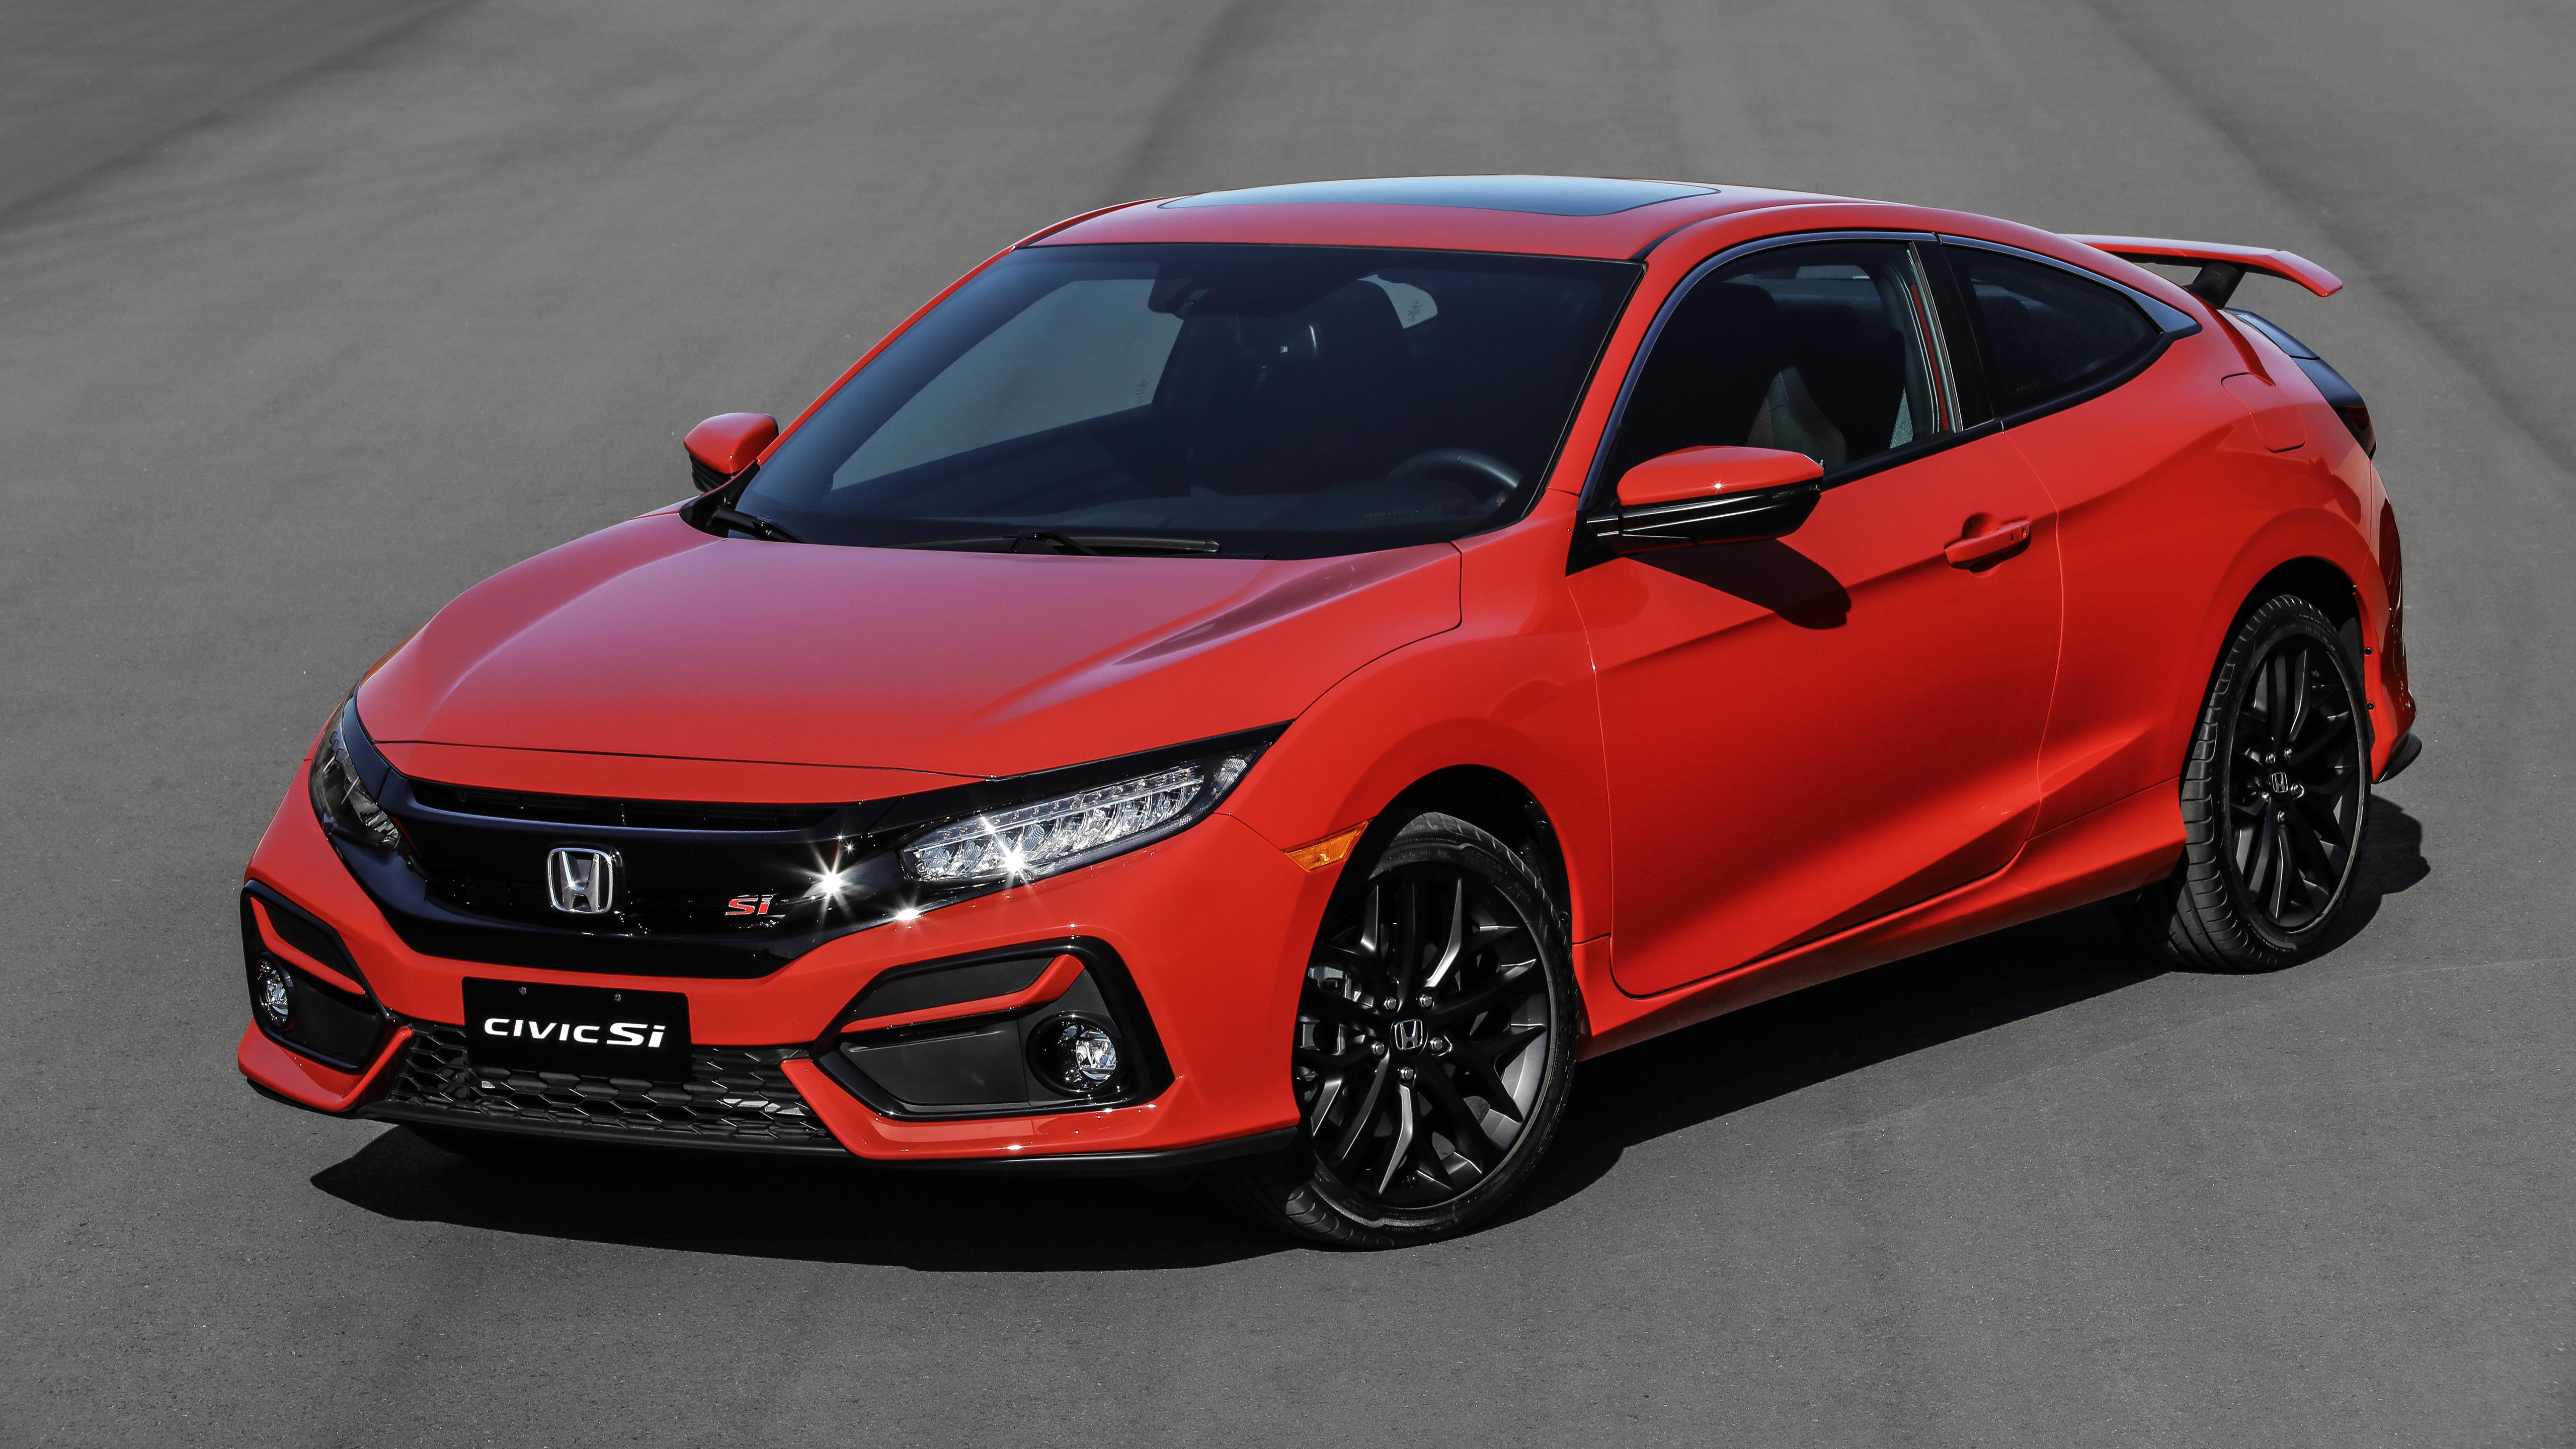 Honda Civic Si Coupe 2020 5k Wallpaper Hd Car Wallpapers Id 15217